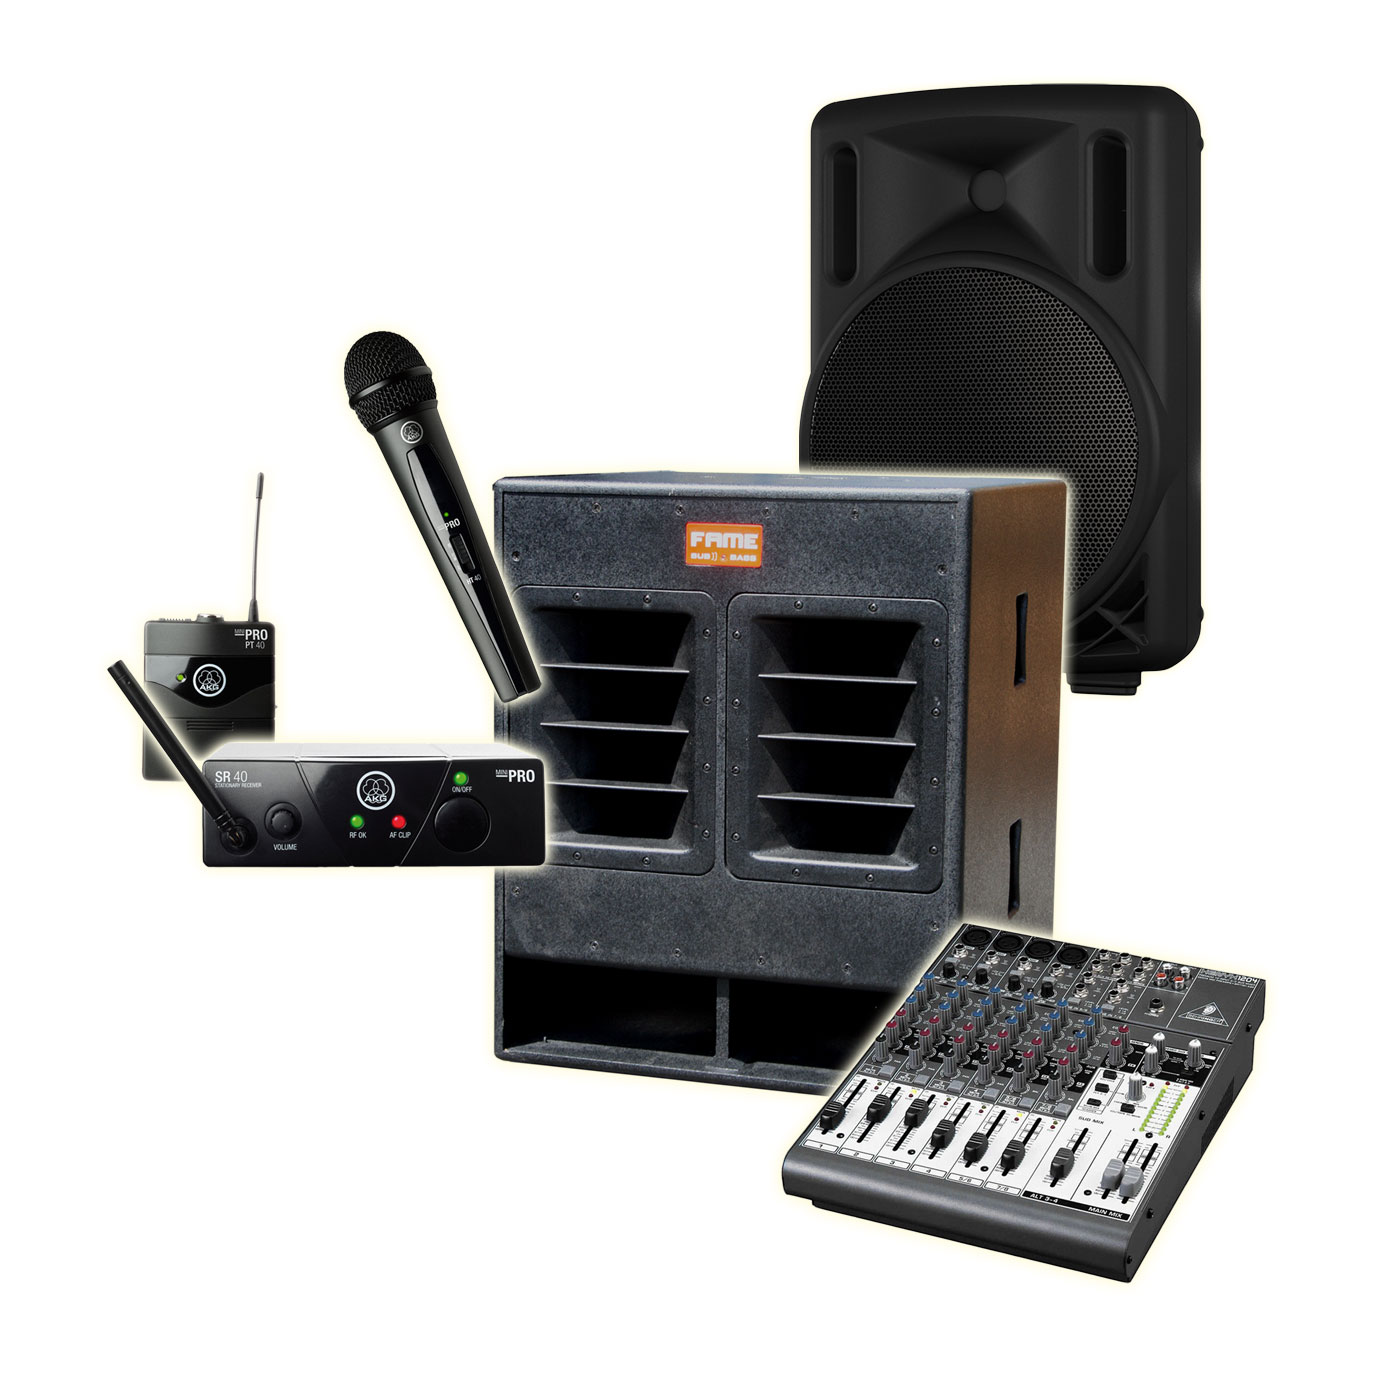 professionelle Tonanlage mit Funkmikrophon